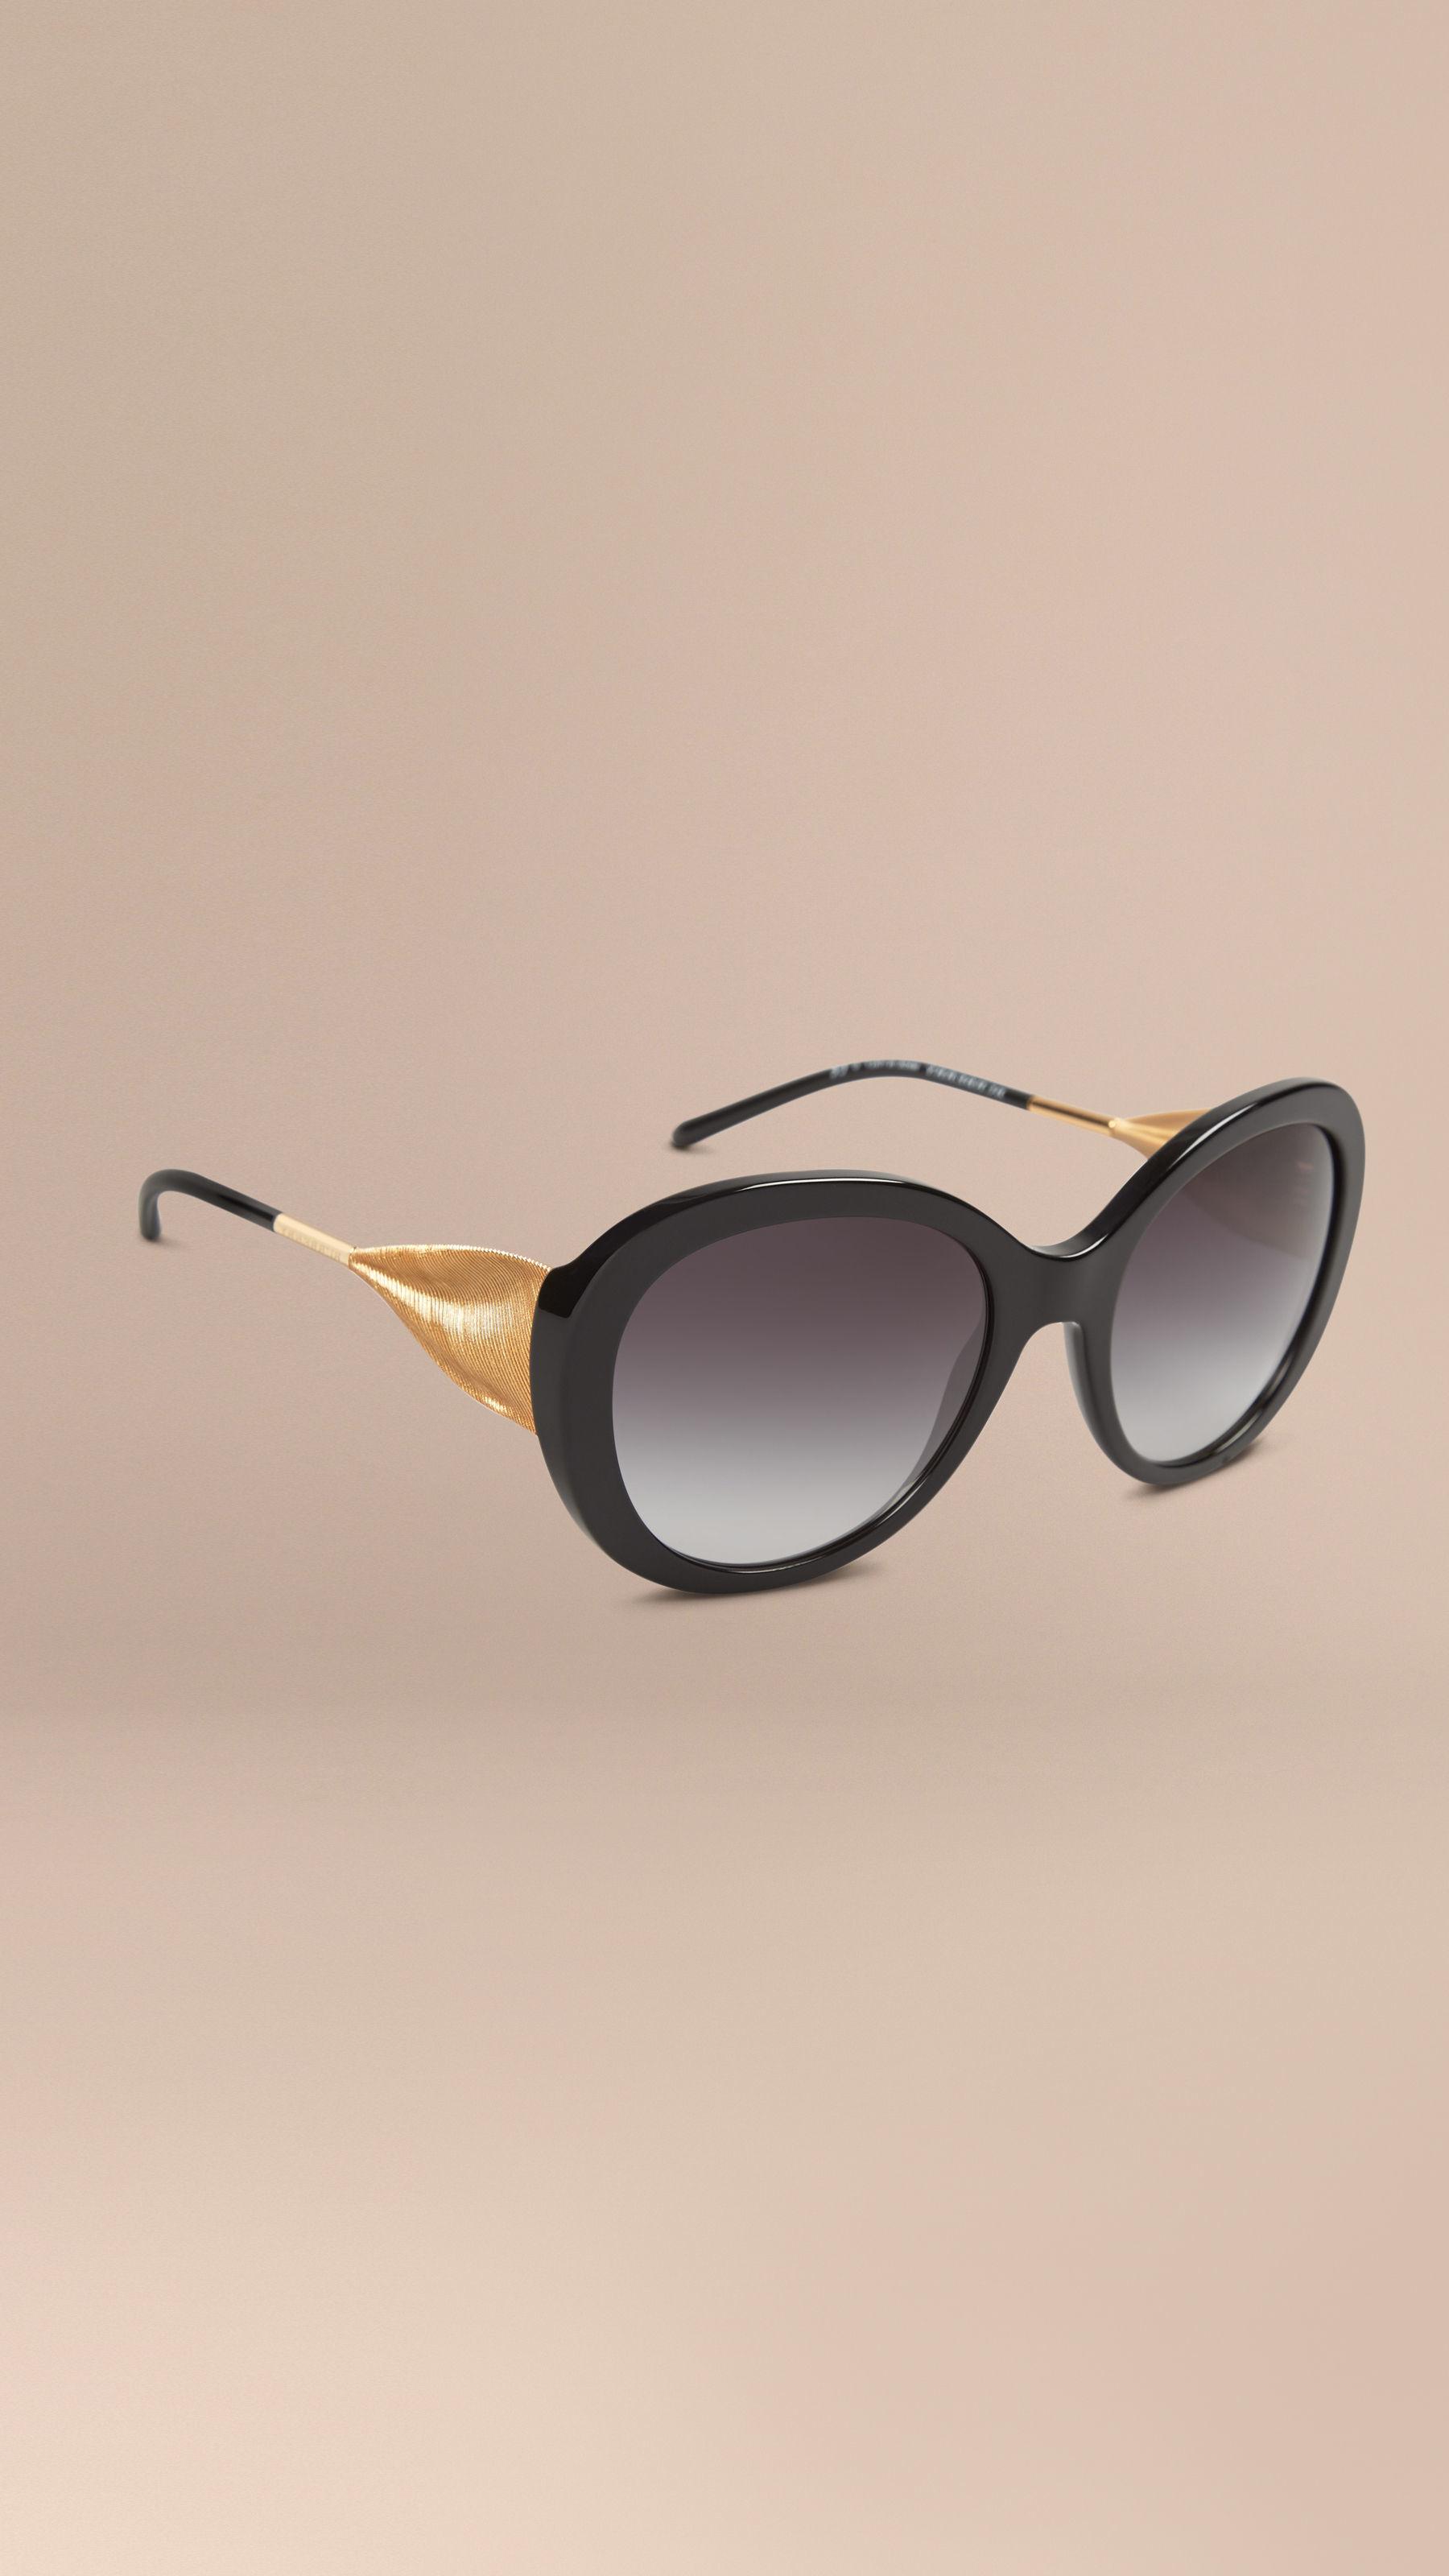 Burberry Black Frame Glasses : Burberry Oversize Round Frame Sunglasses Black in Black Lyst